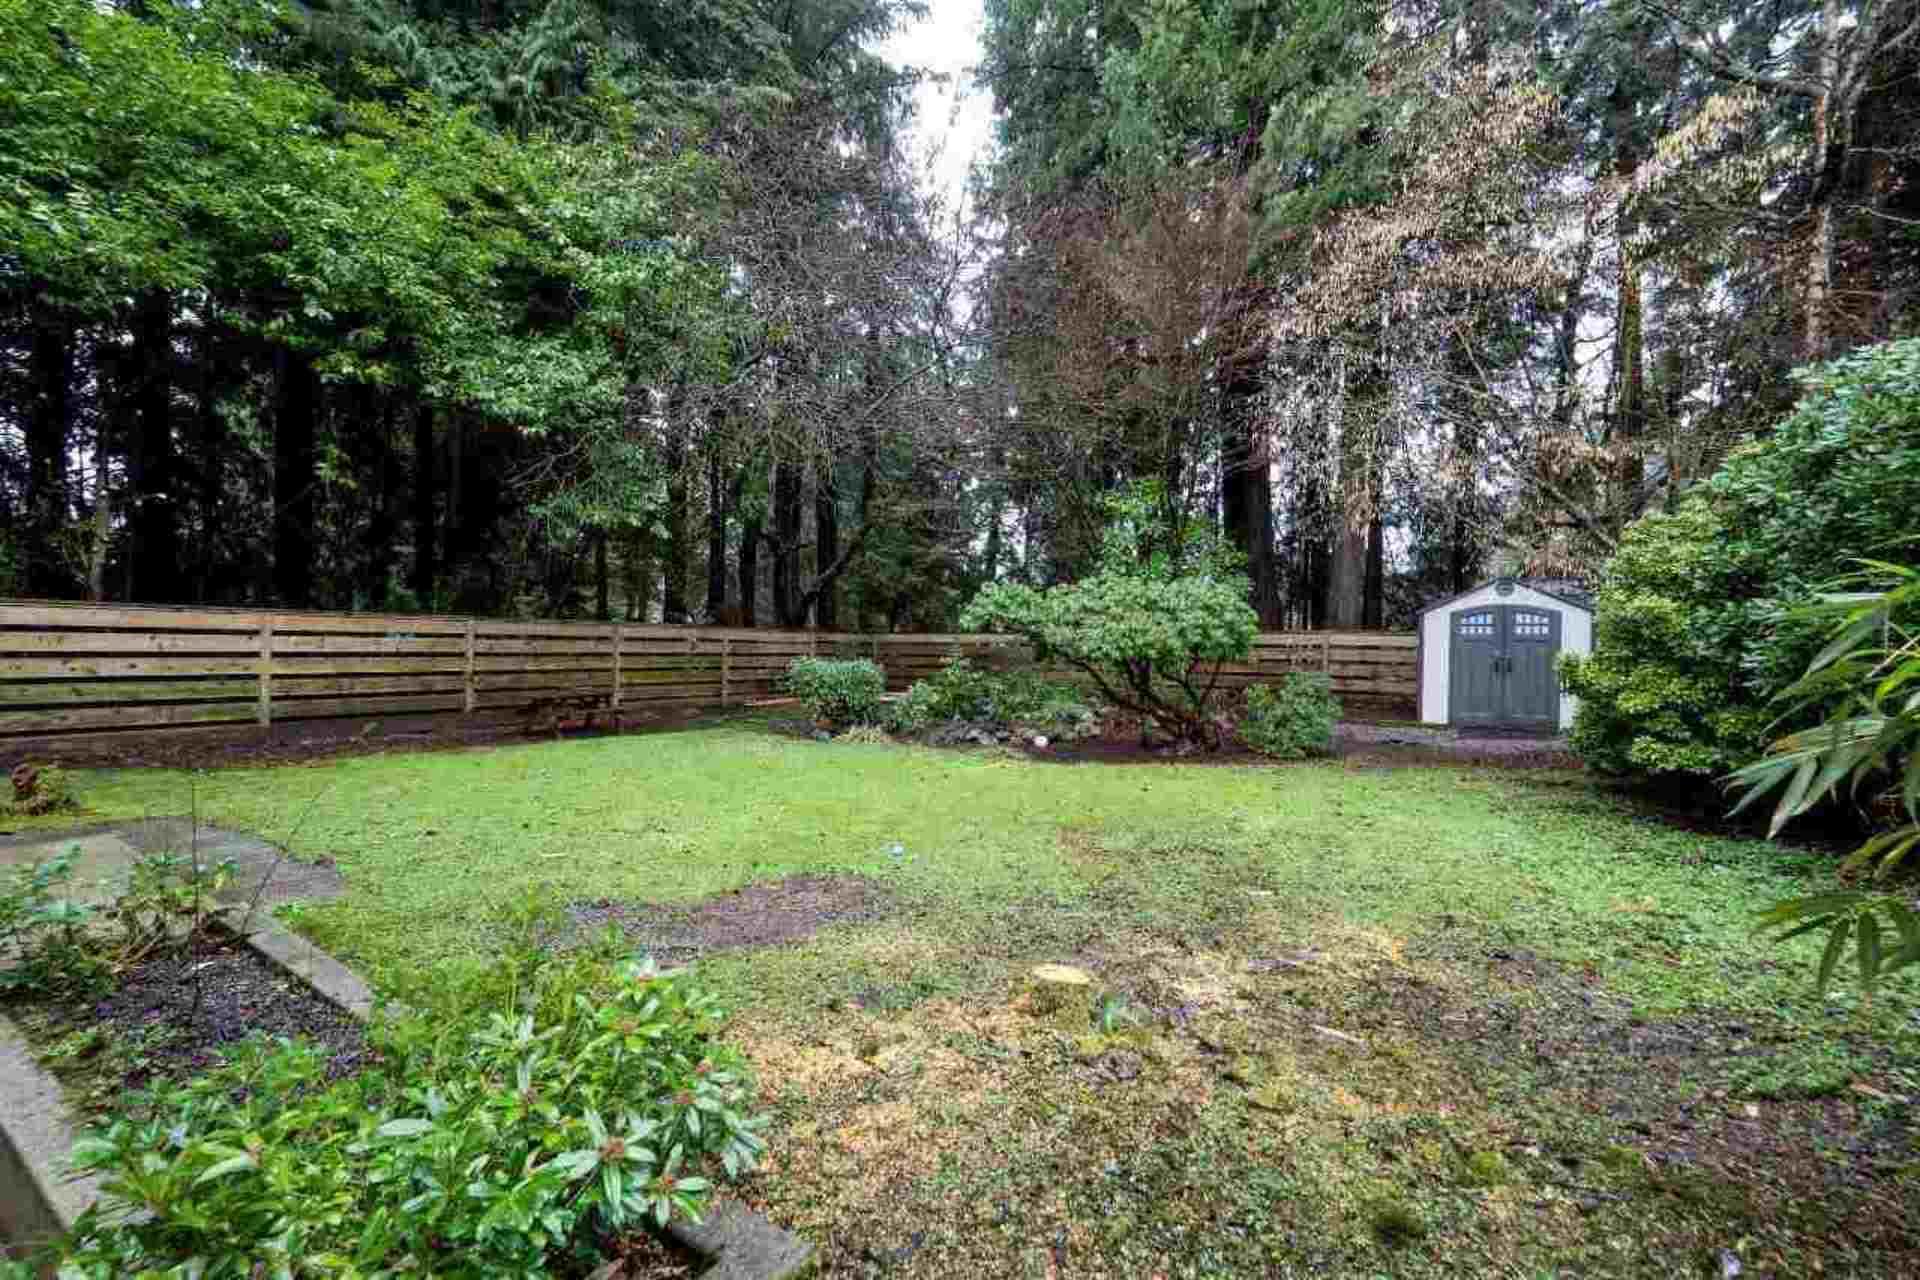 3219-allan-road-lynn-valley-north-vancouver-15 at 3219 Allan Road, Lynn Valley, North Vancouver